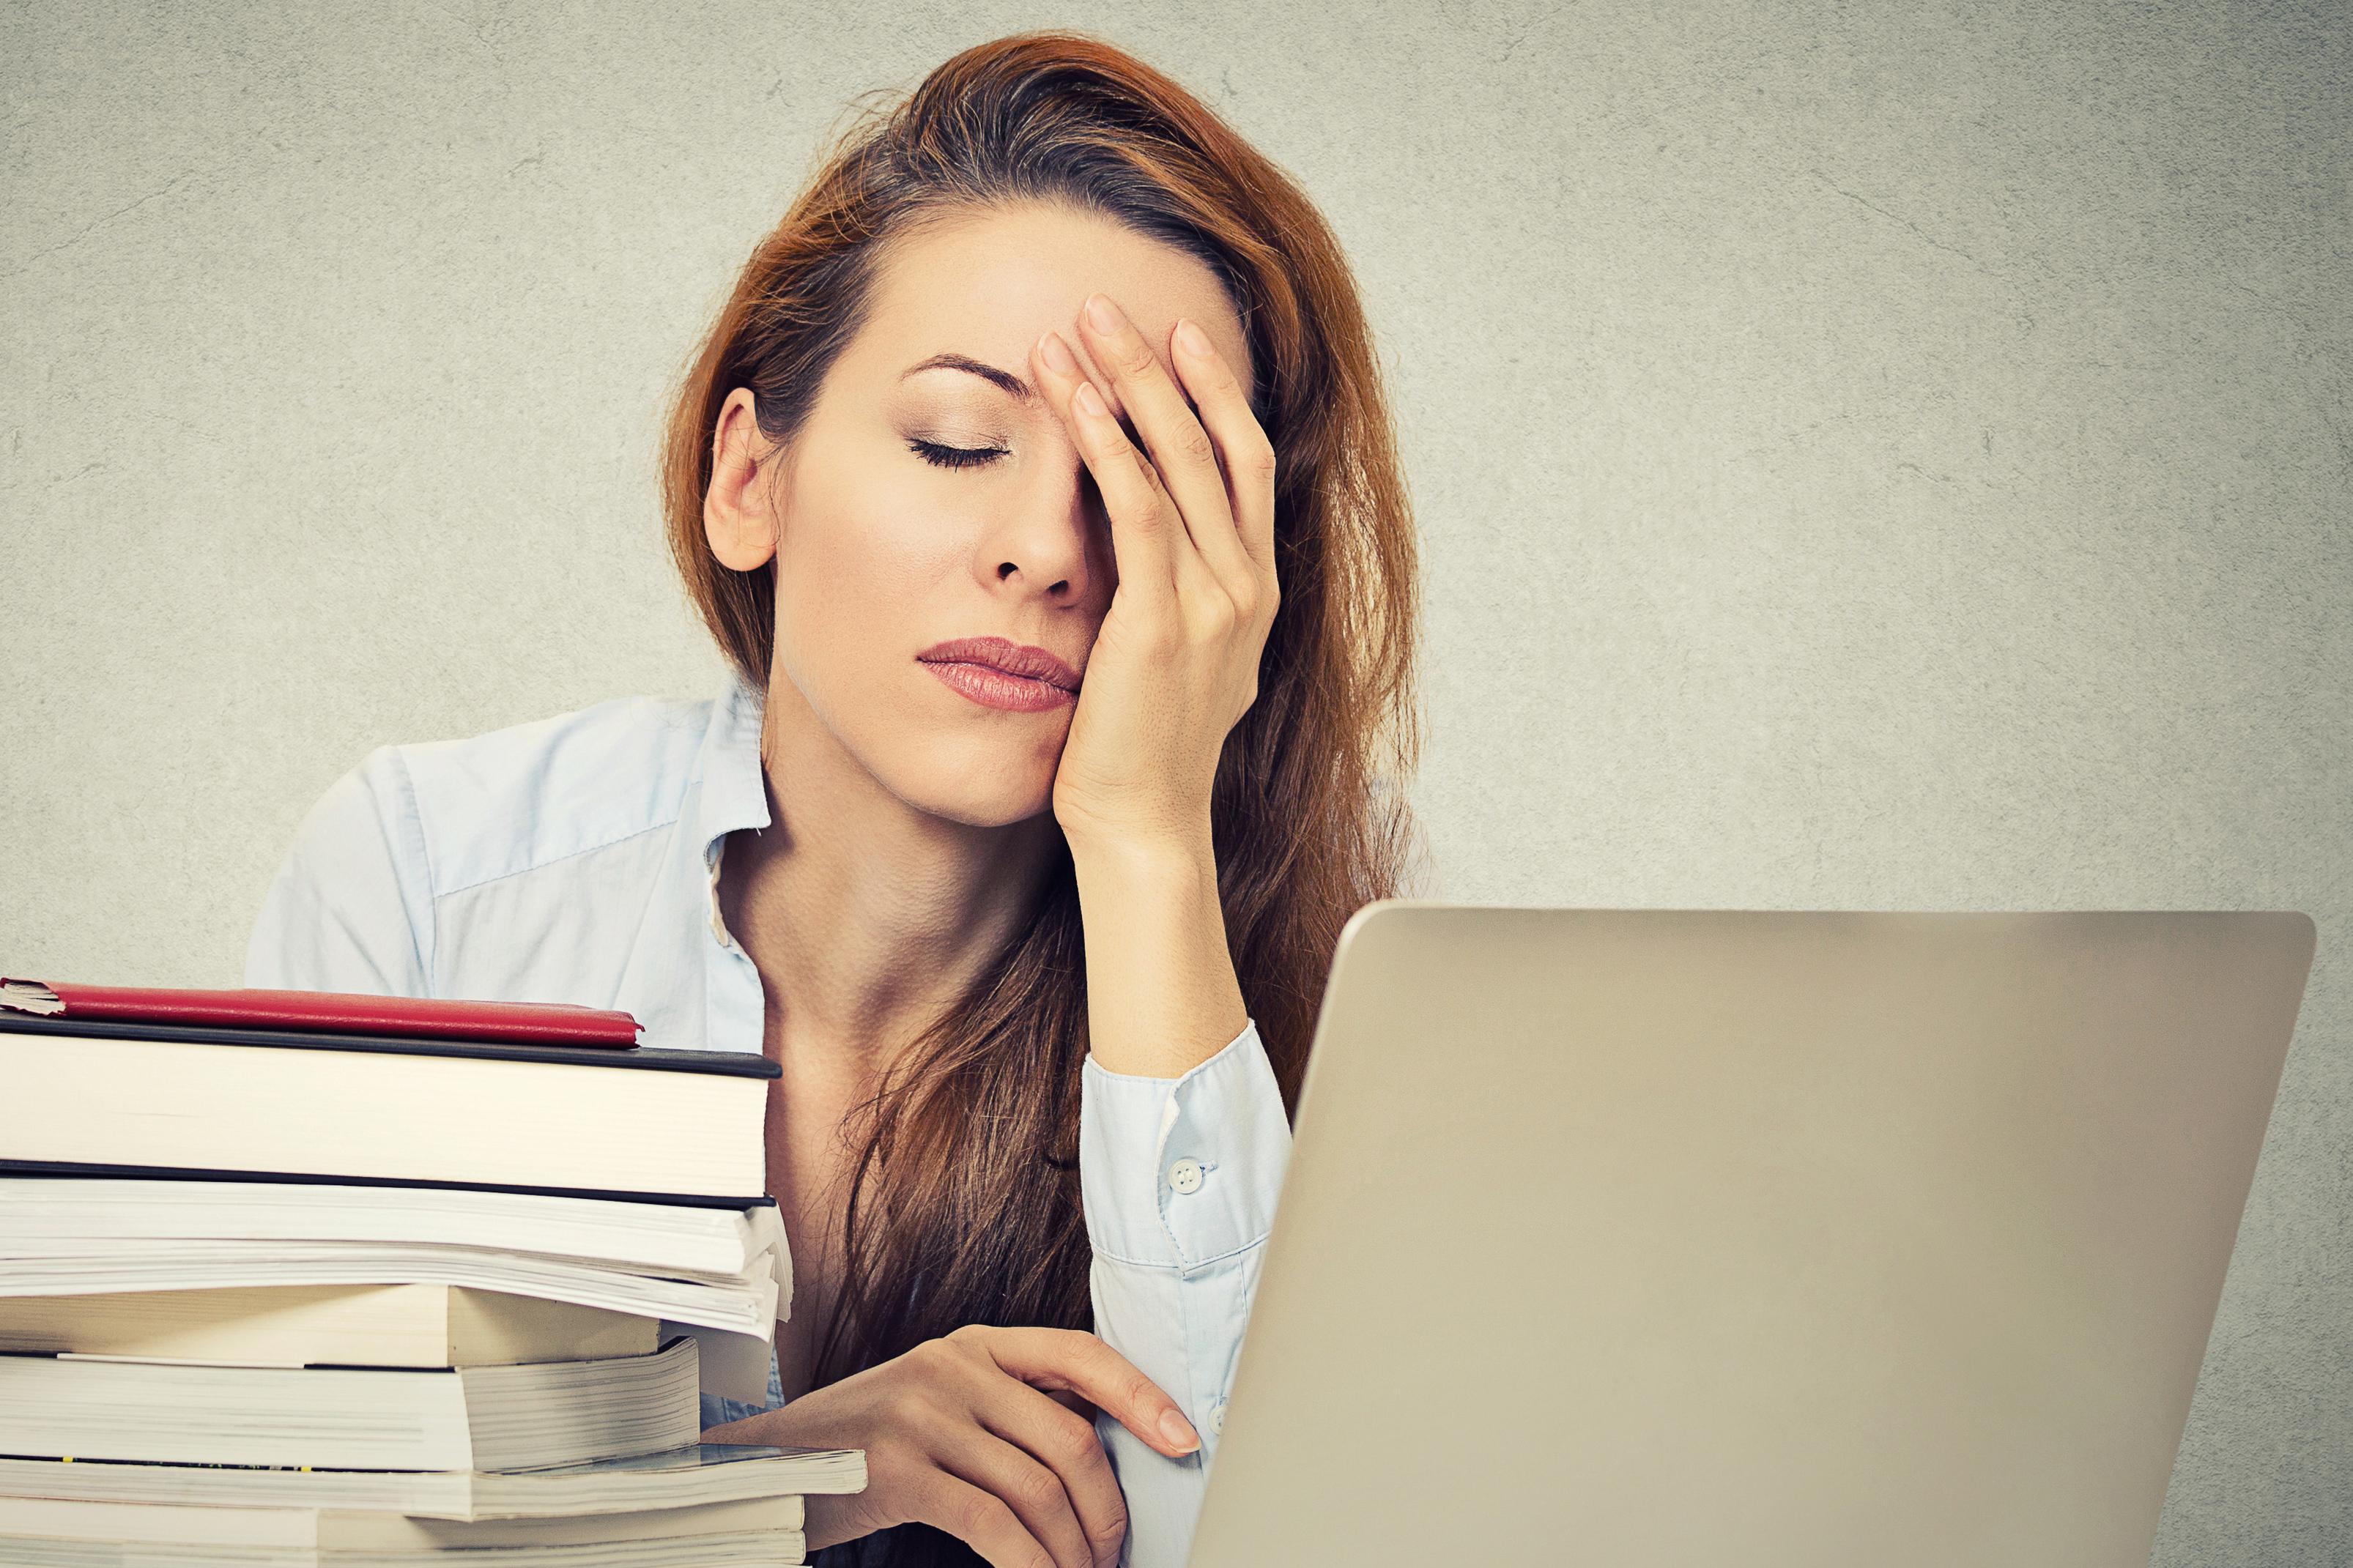 Article image for Lack of sleep costing Australian economy billions of dollars